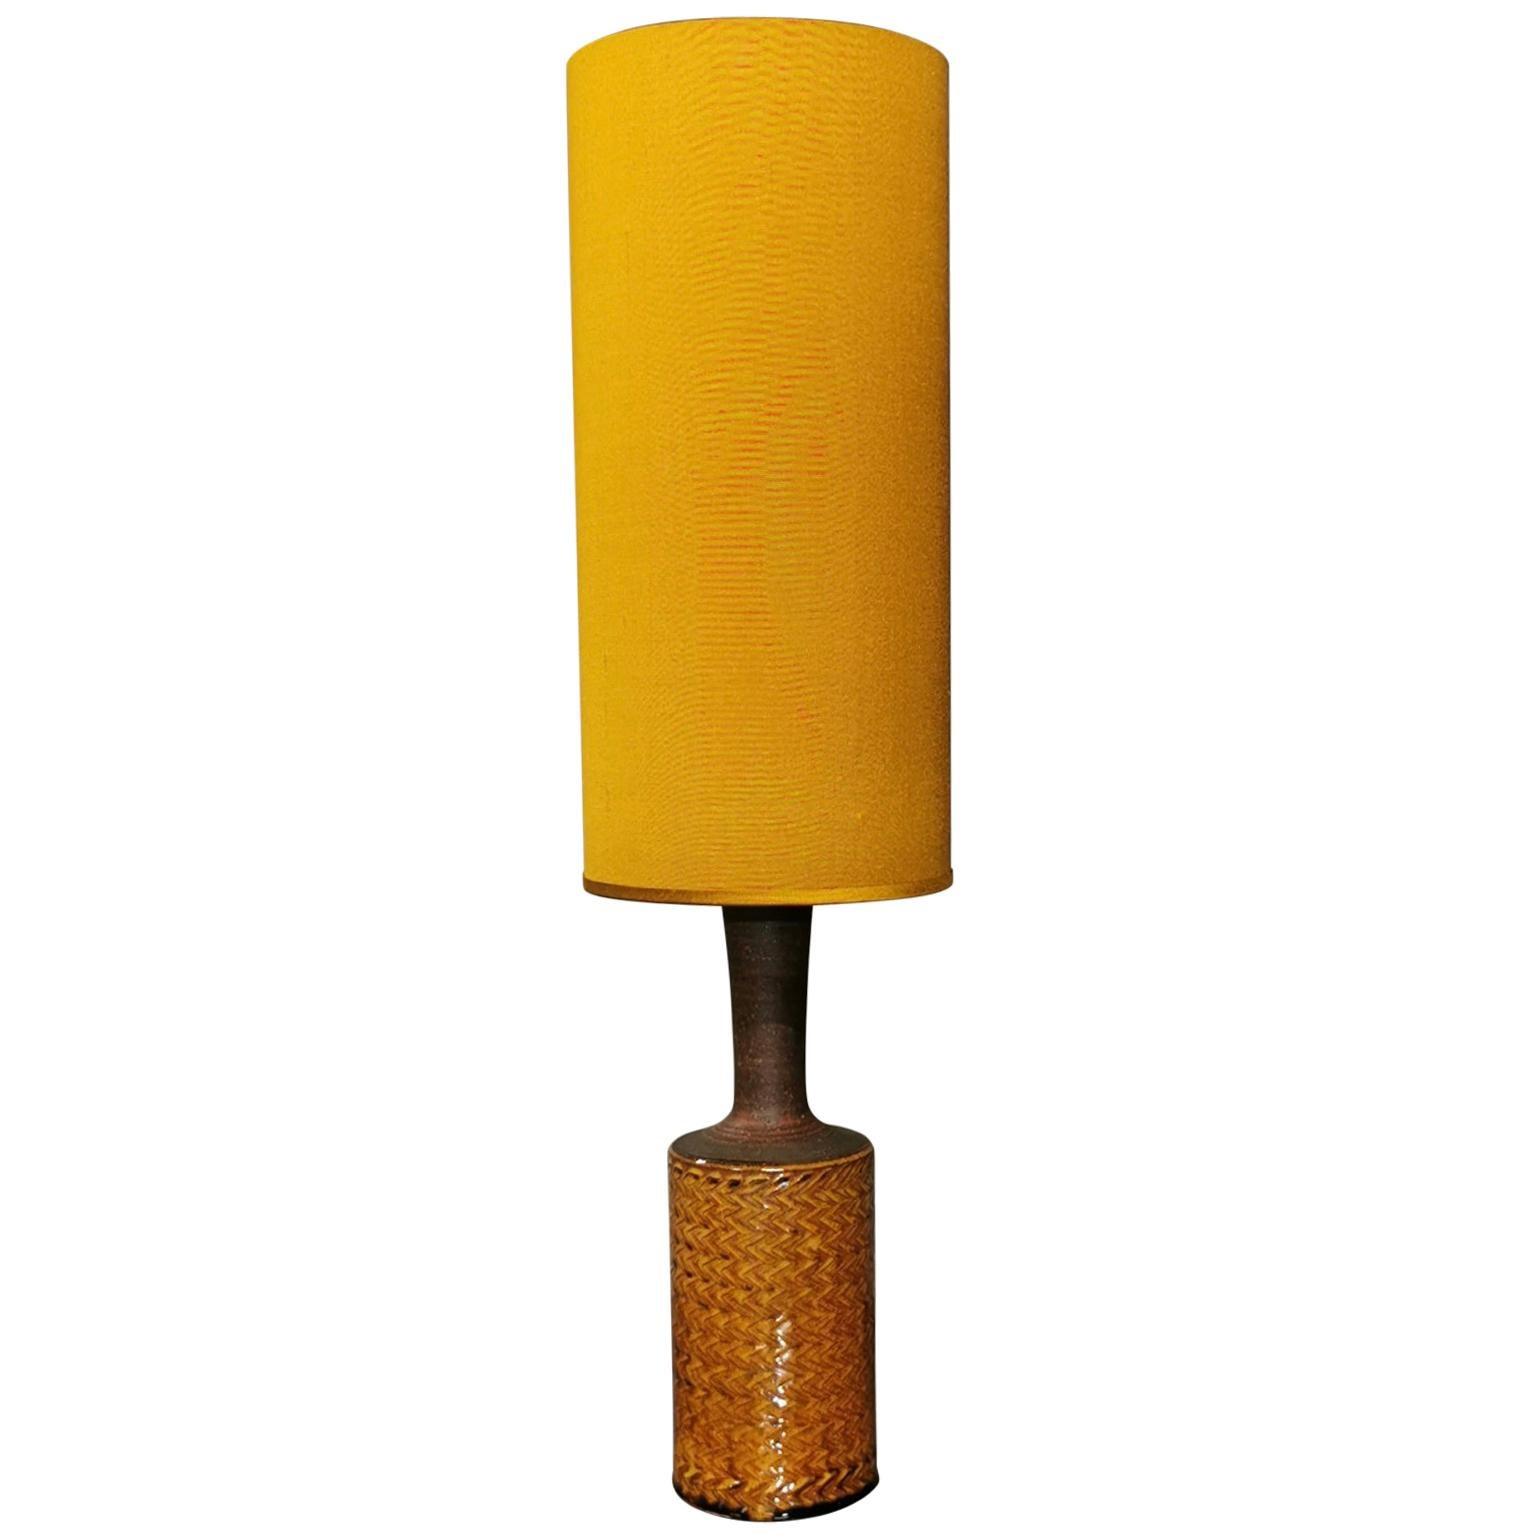 Stoneware Table Lamp by Nils Kähler, Denmark, 1960s